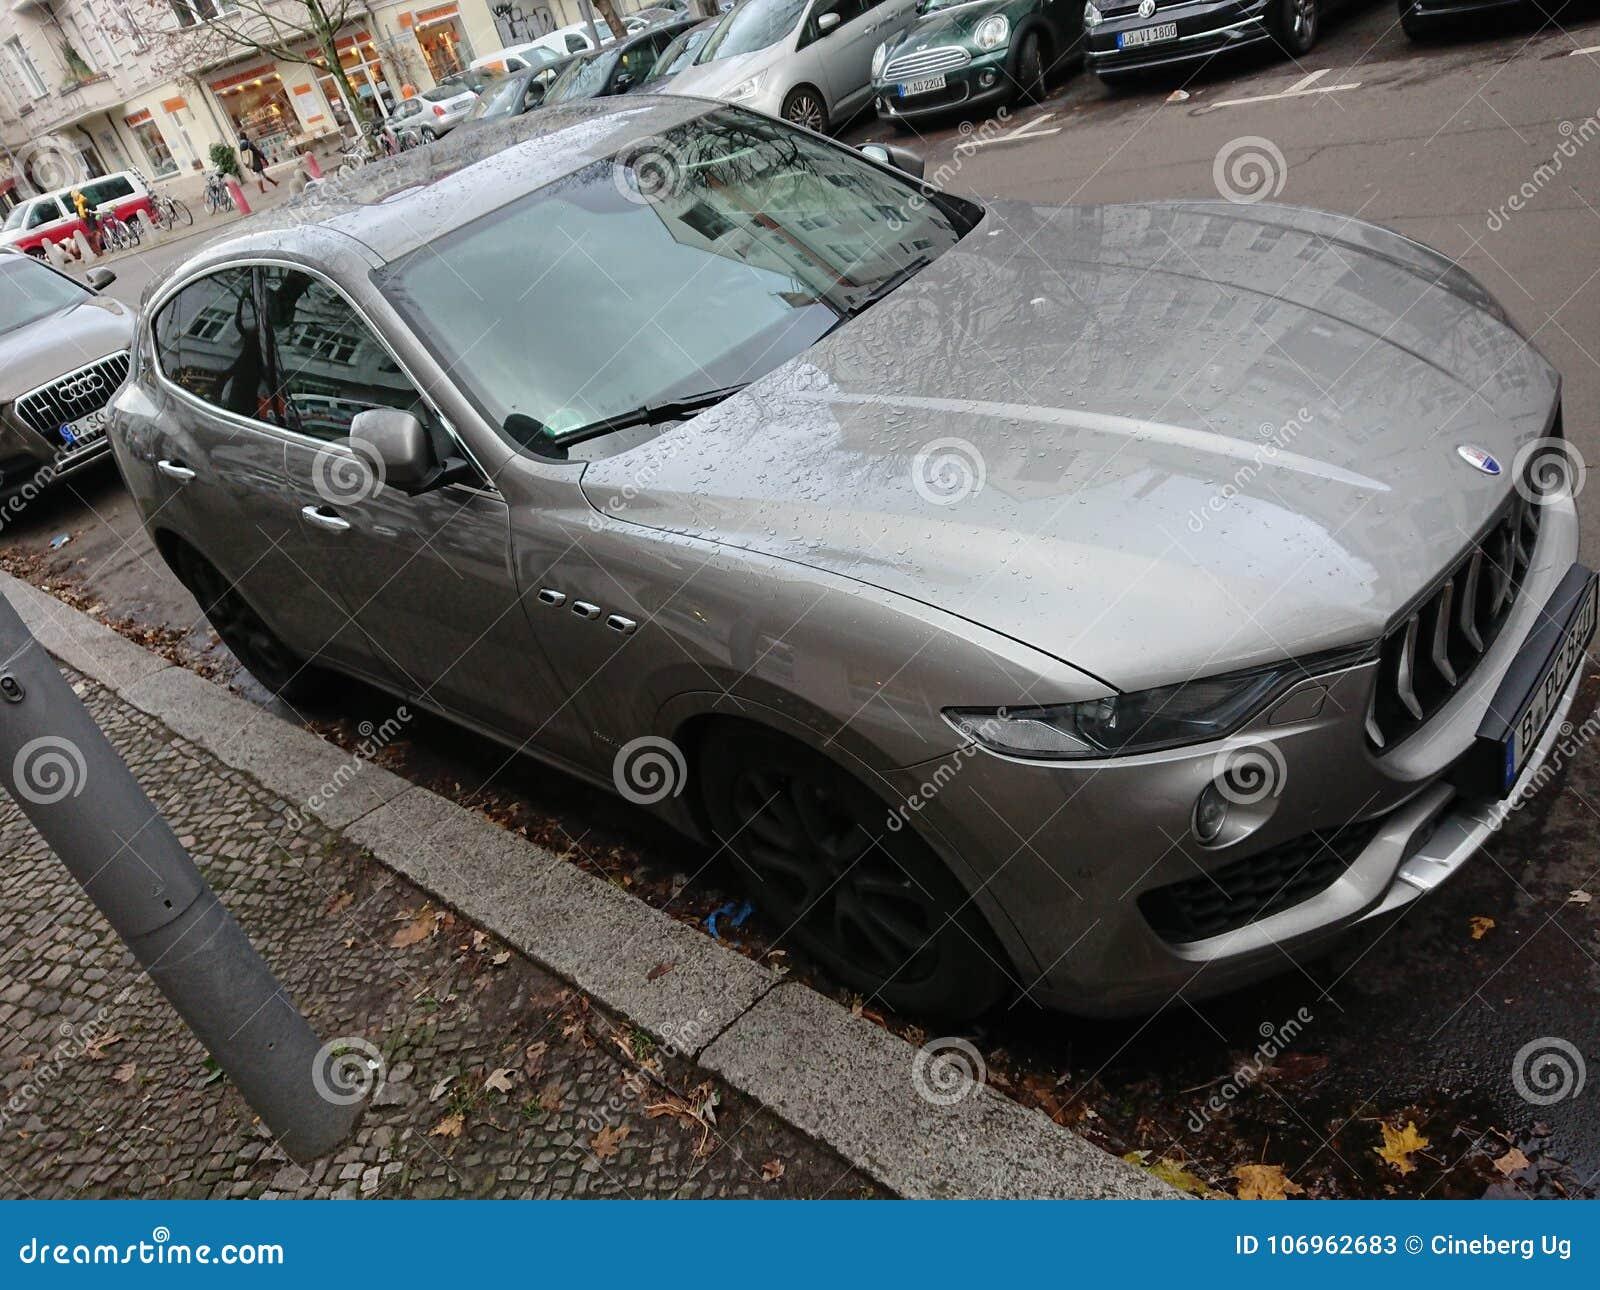 Grey Maserati Car With Trident Logo Editorial Stock Photo - Image of ...